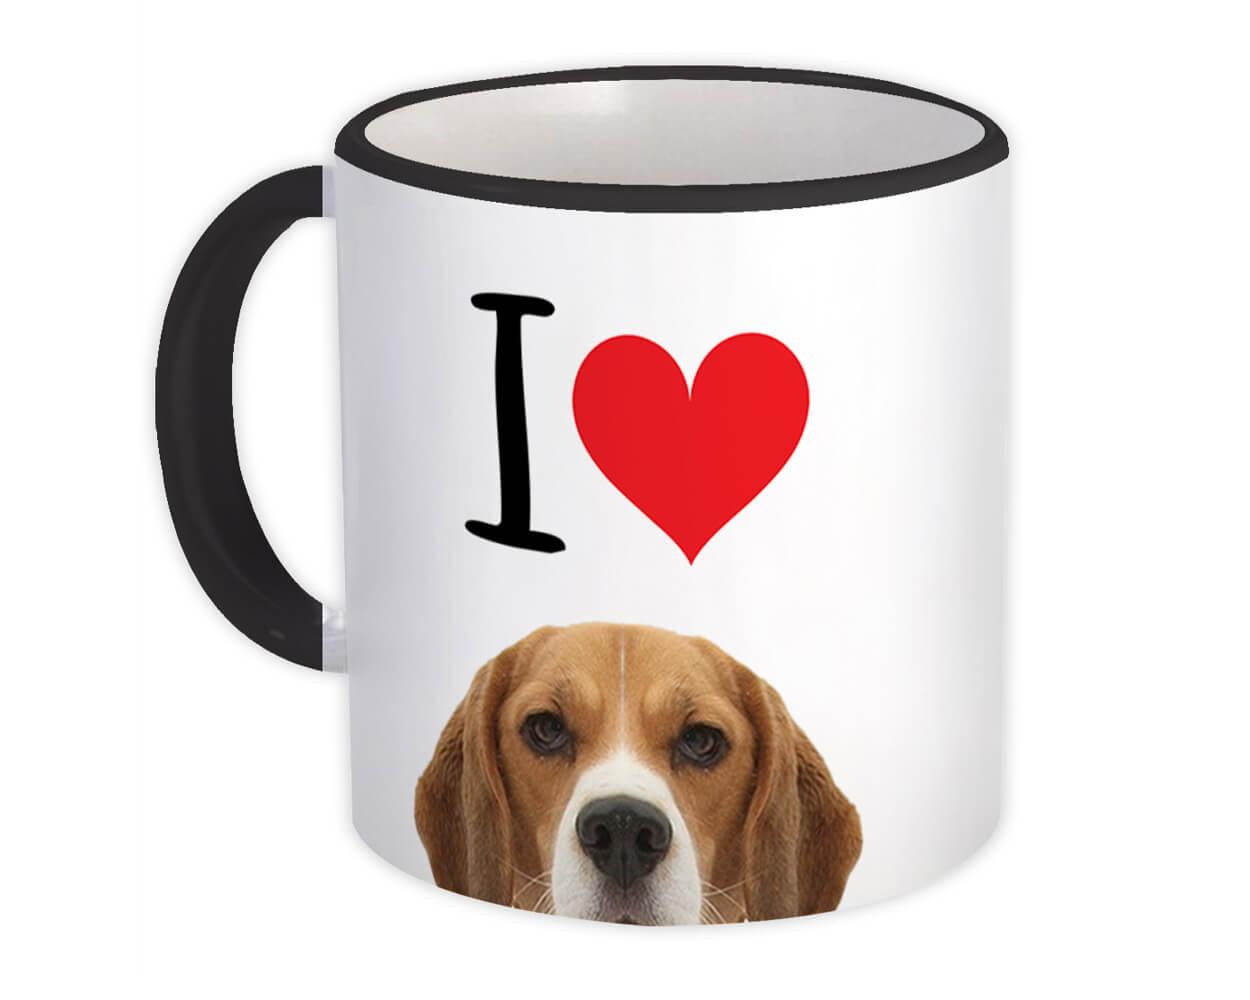 I Love Beagle : Gift Mug Dog Lover Funny Owner Heart Cute Pet Mom Dad